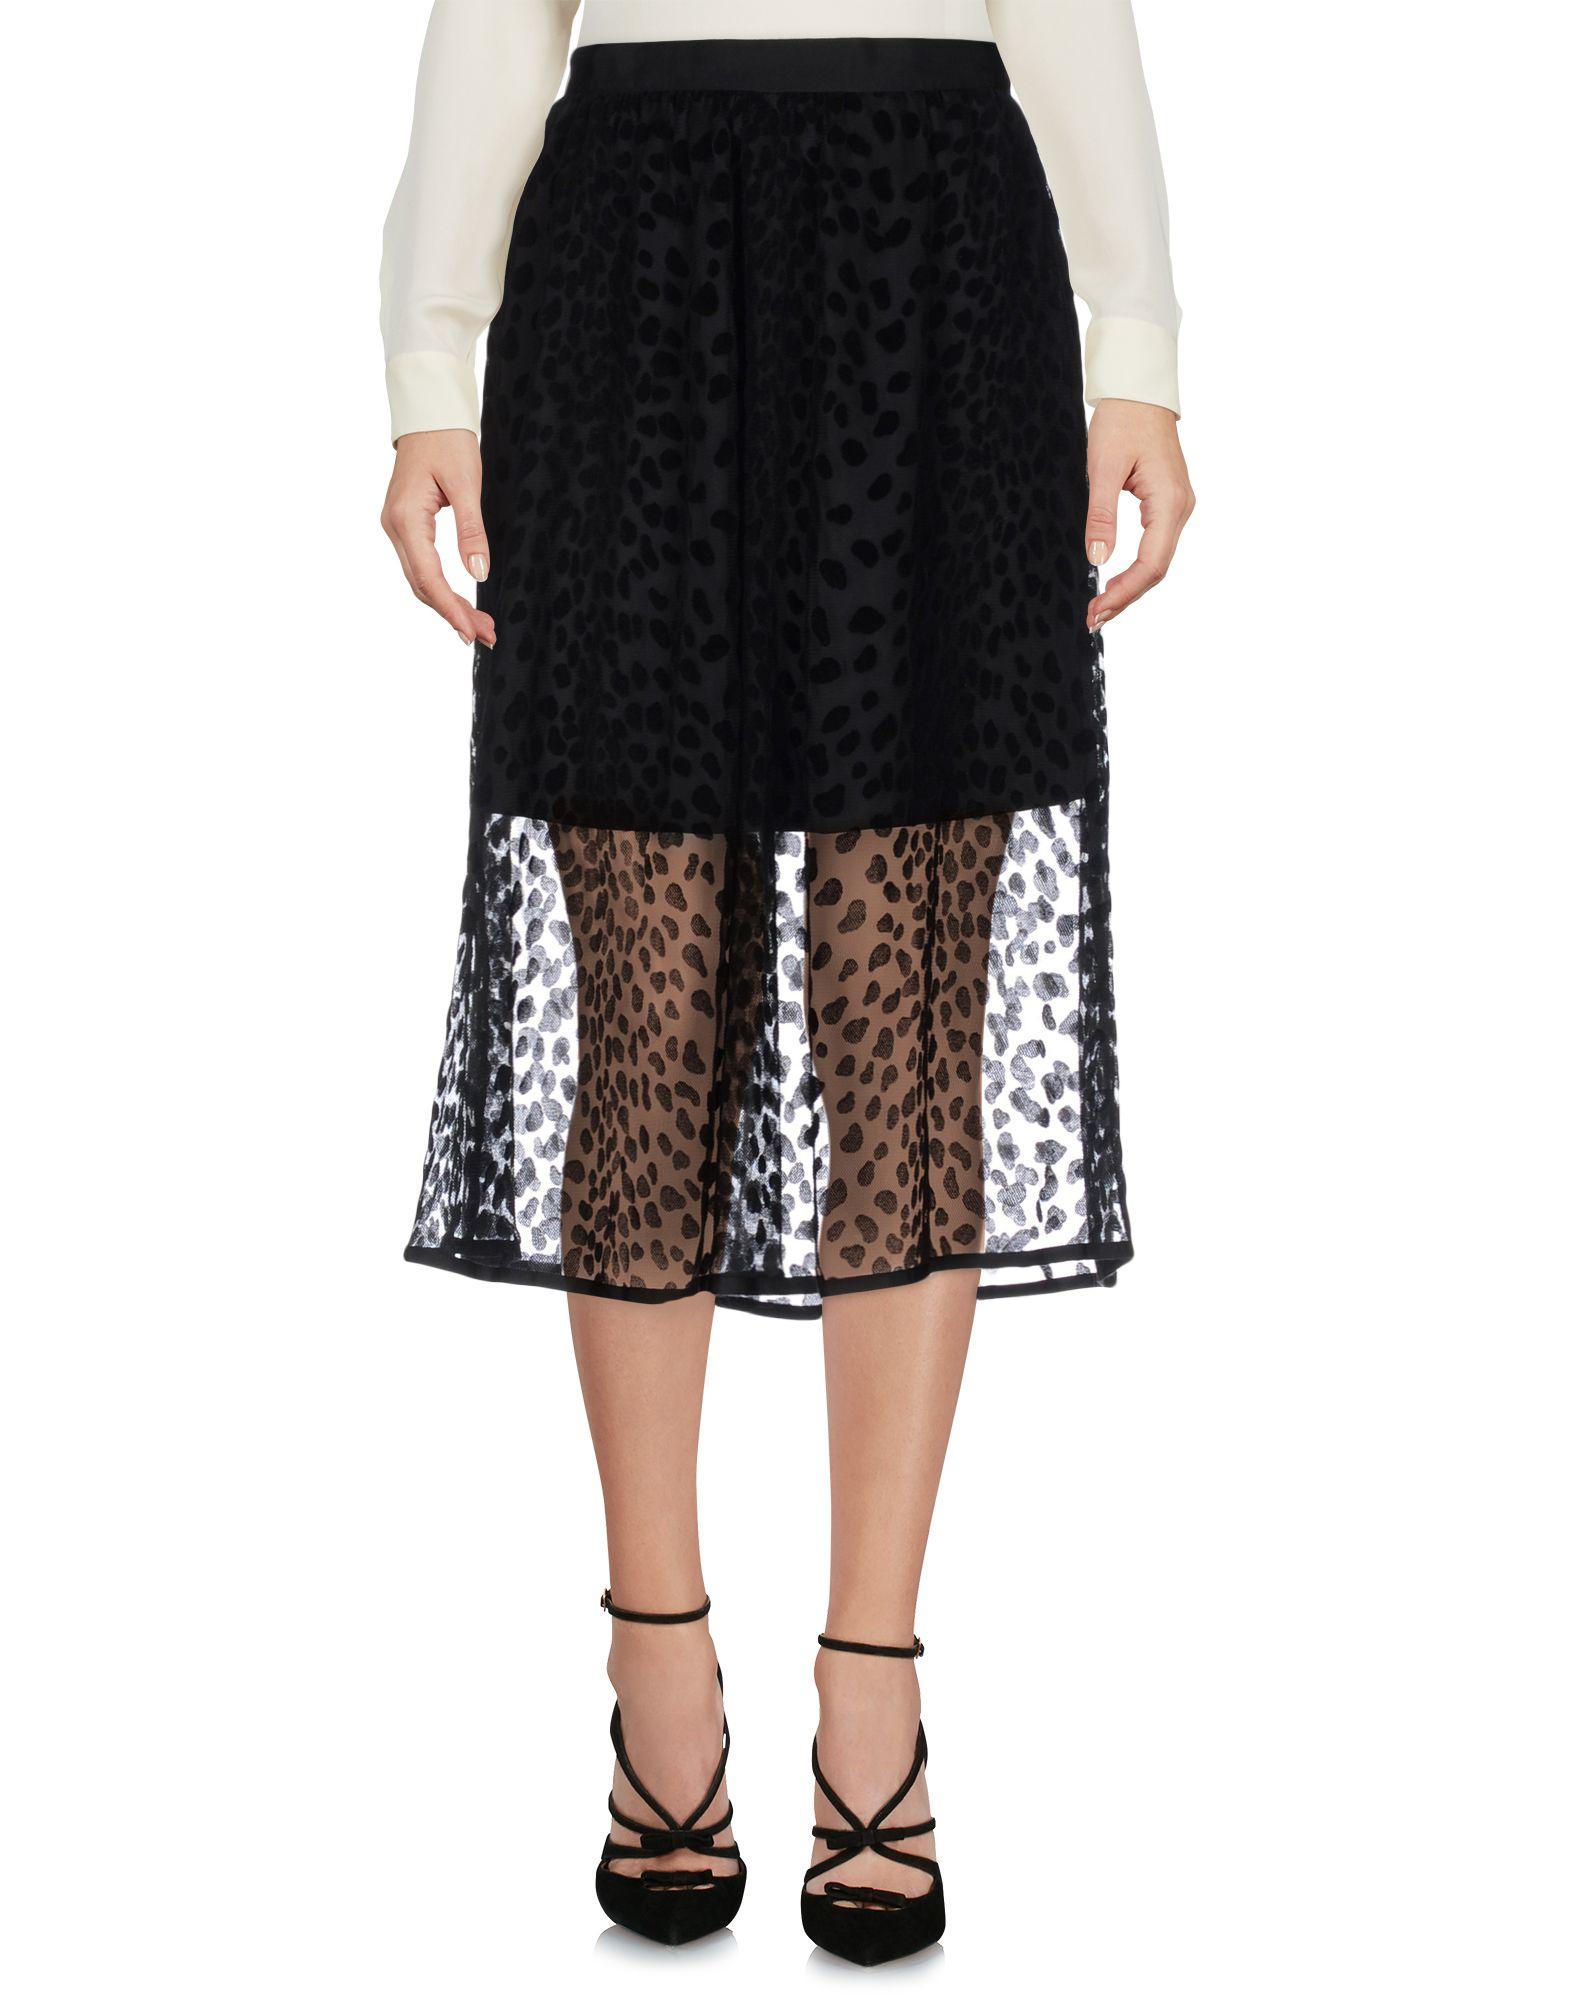 DRESS GALLERY Юбка длиной 3/4 [wamami] 699 classical chinese ancient dress cheongsam for 1 4 msd aod dod bjd dollfie